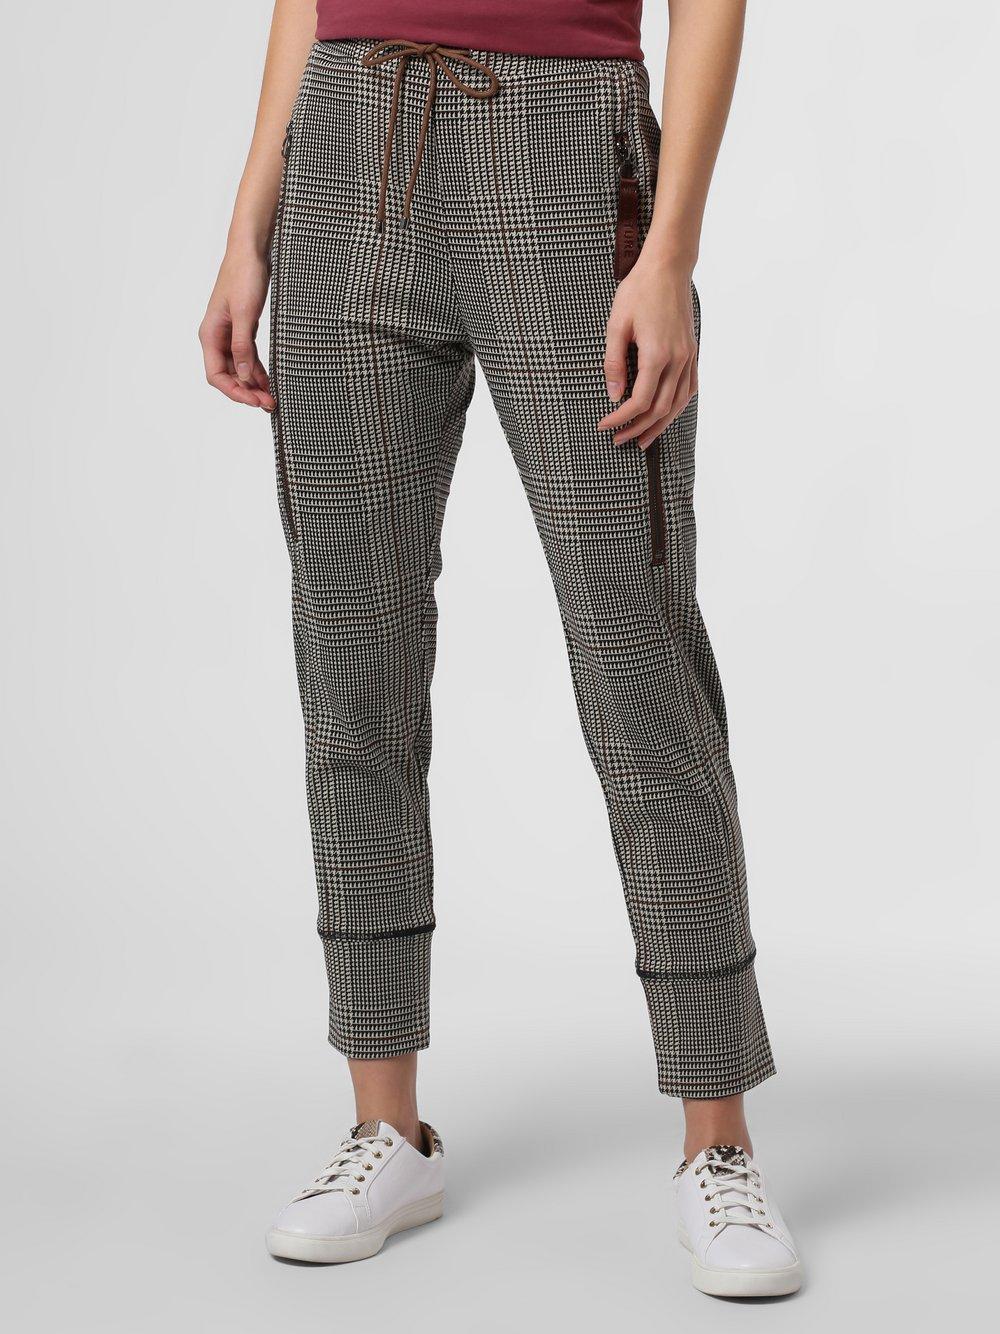 MAC – Damskie spodnie – Future, brązowy Van Graaf 483744-0001-00340